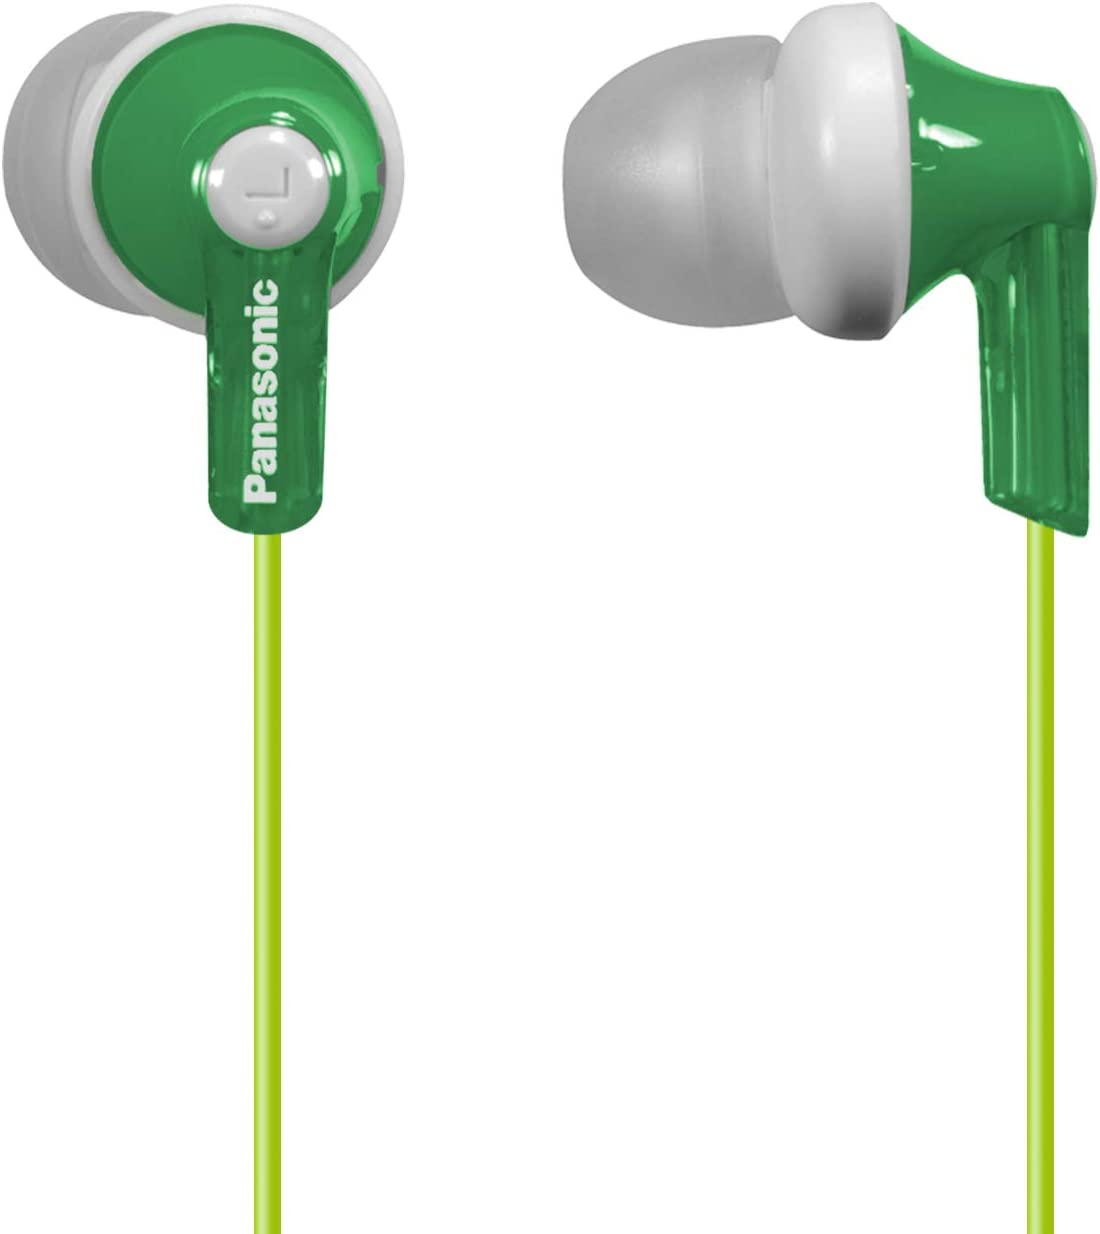 Panasonic ErgoFit In-Ear Earbud Headphones RP-HJE120-G (Green) Dynamic Crystal Clear Sound, Ergonomic Comfort-Fit